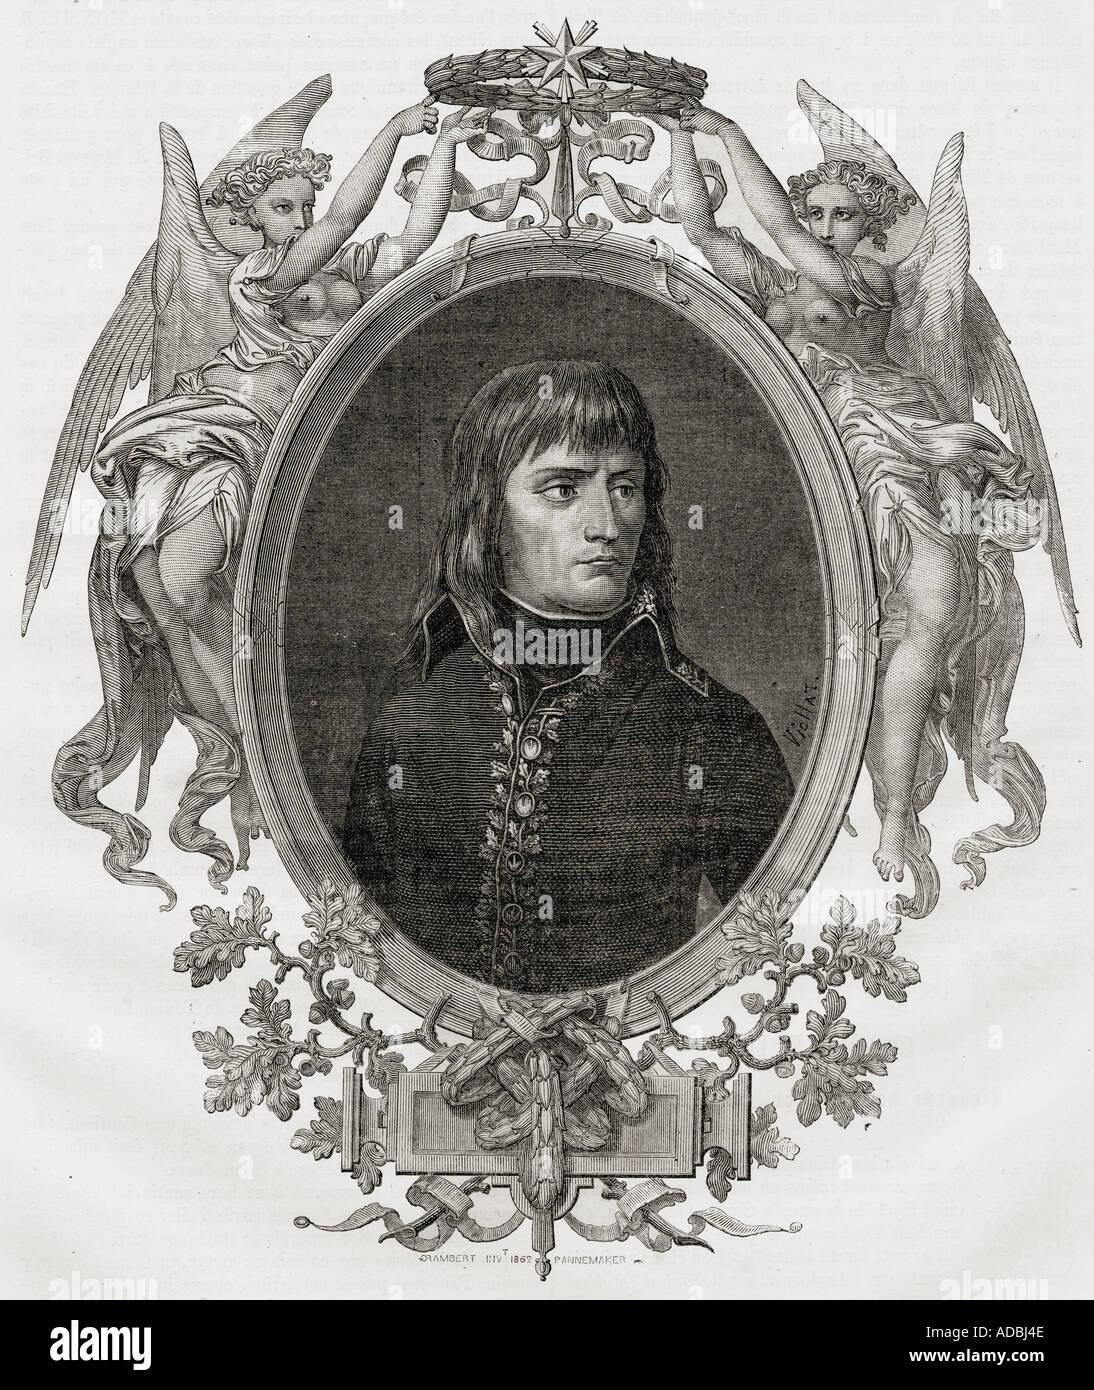 Napoleon Bonaparte at the seige of Toulon December 1793 Napoleon Bonaparte 1769 1821 Emperor of the French - Stock Image